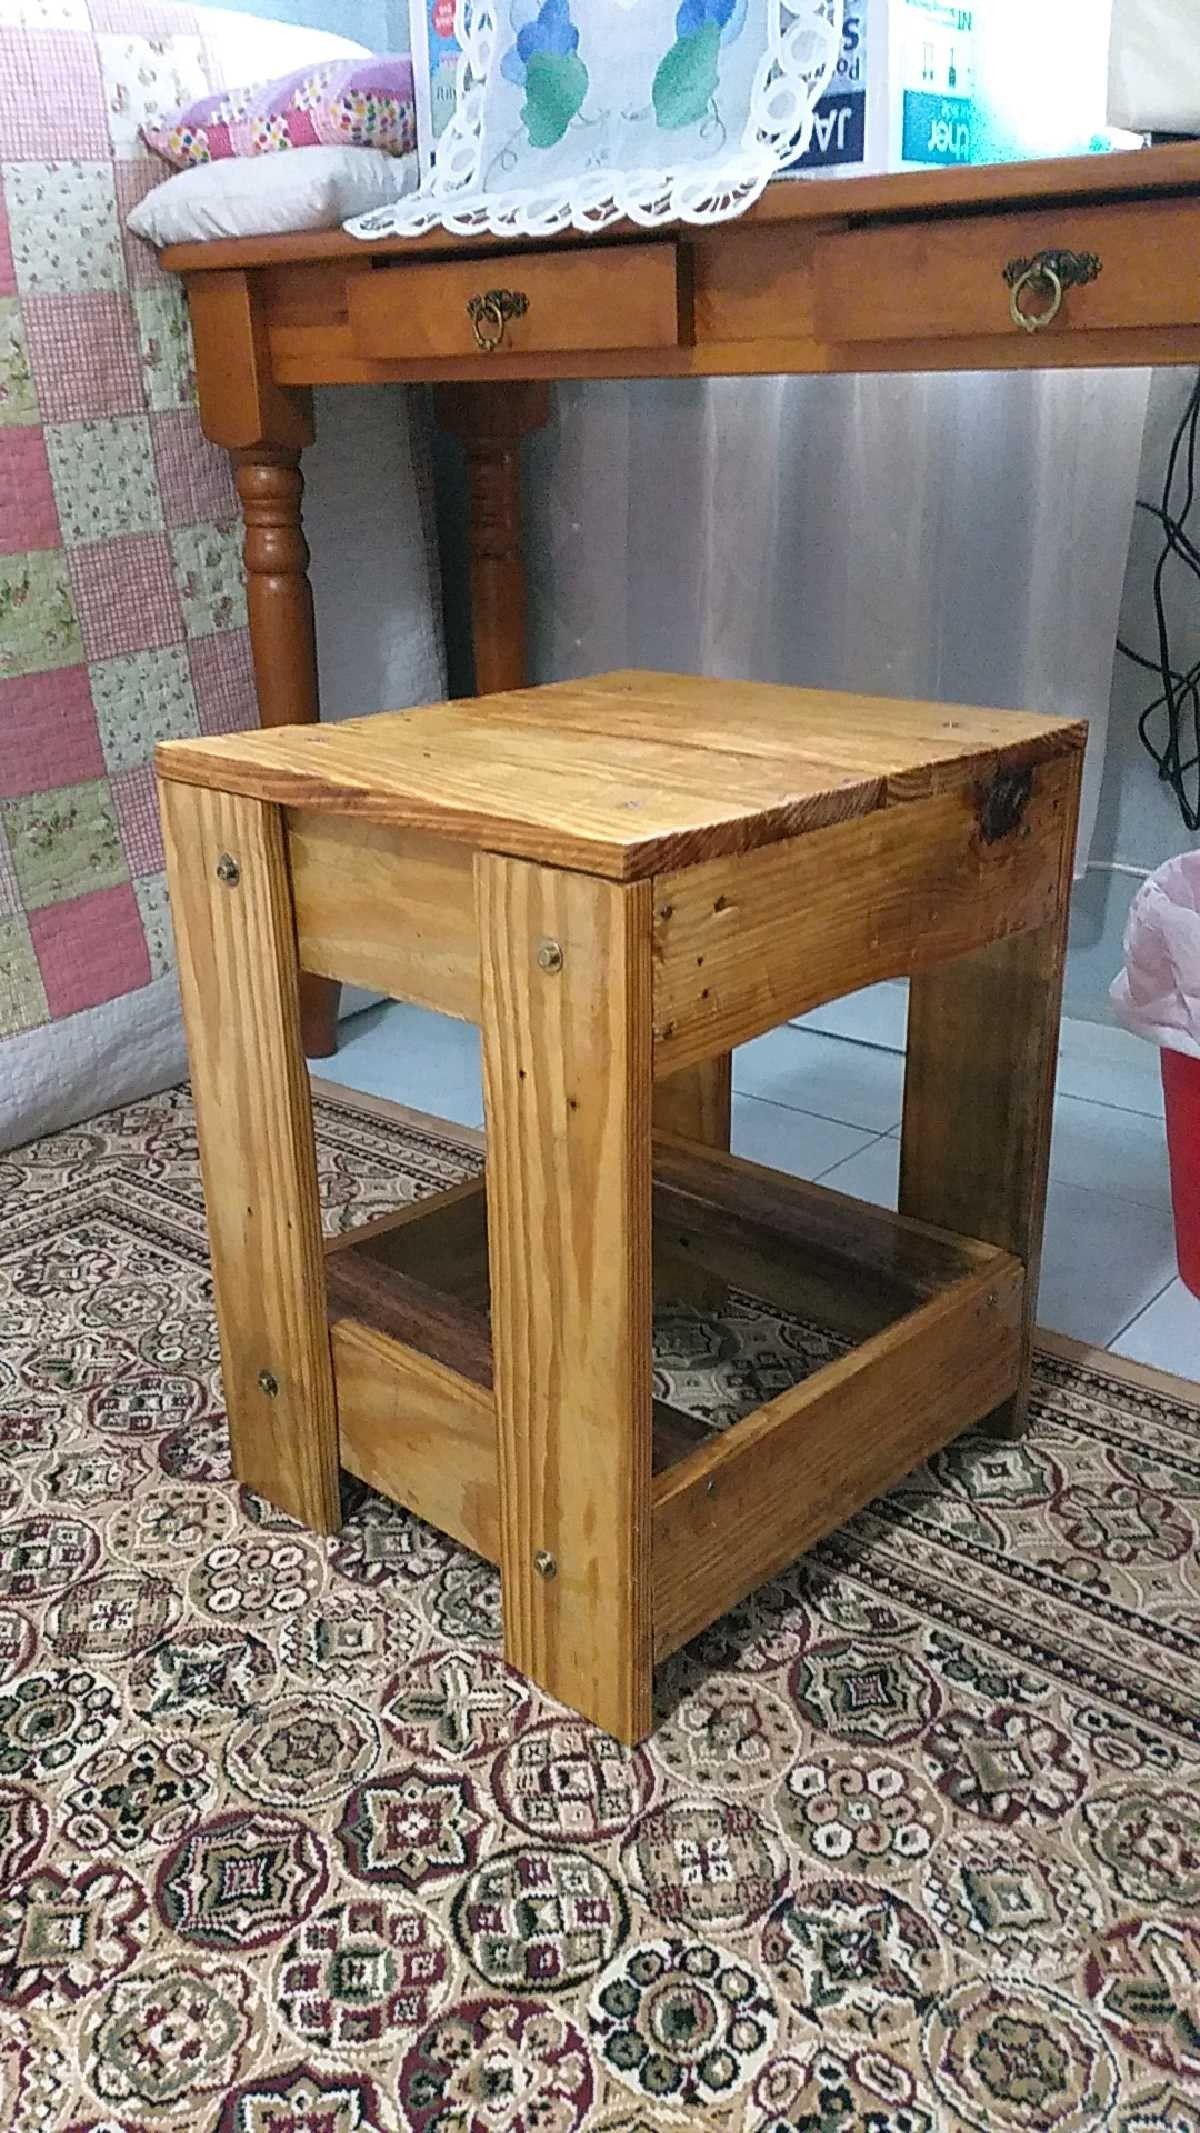 Bangku kecil dari kayu palet | Kursi kayu palet, Perabot ...